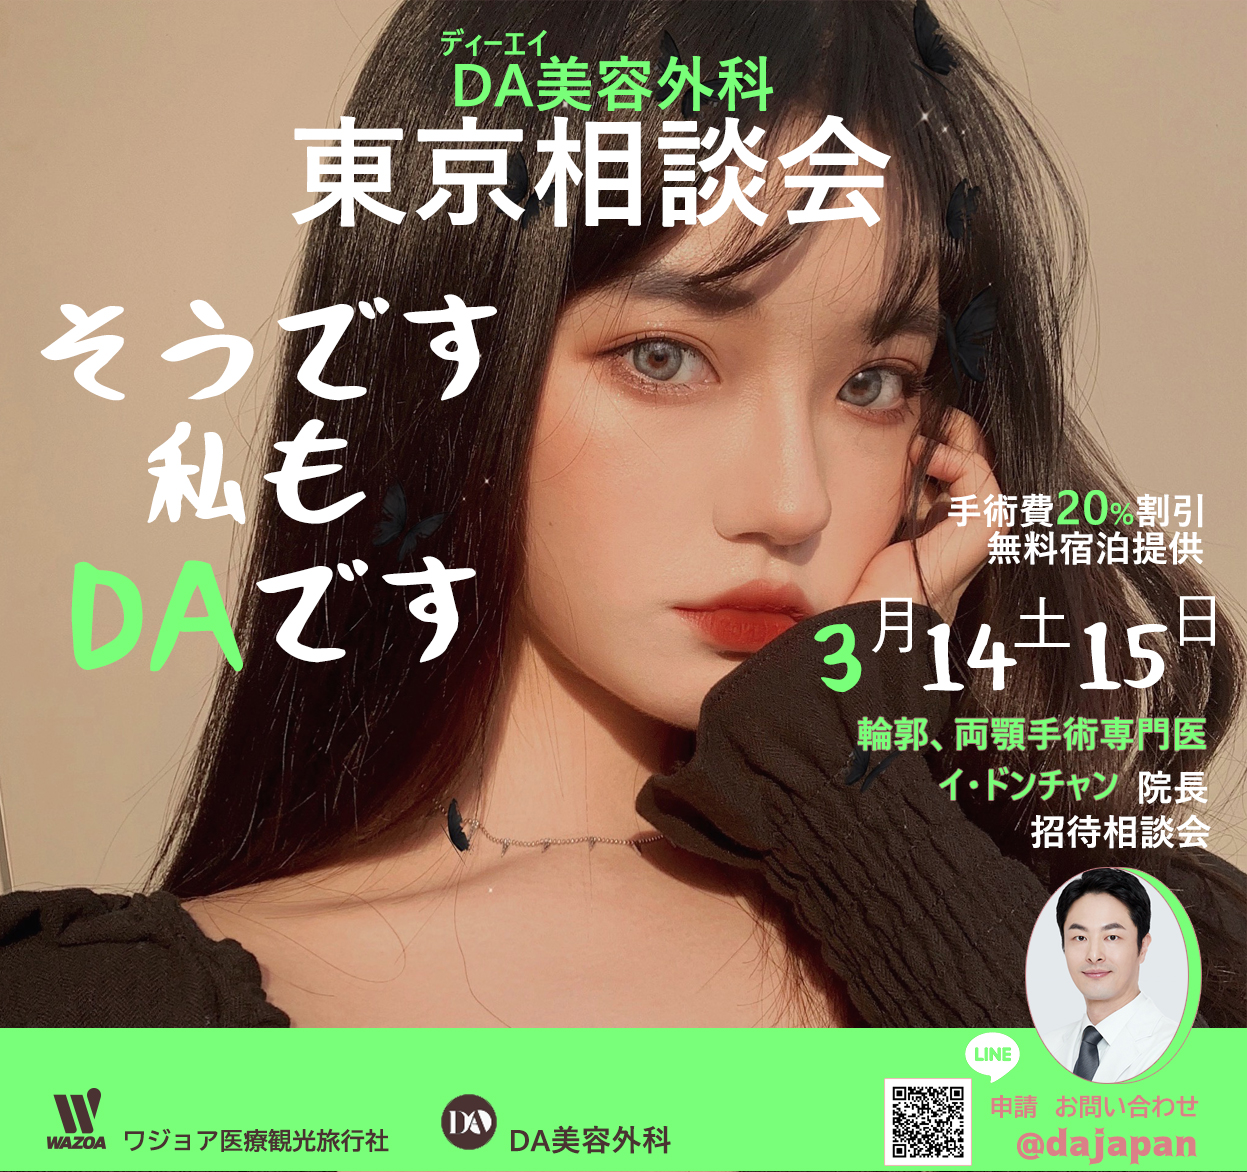 DA美容外科 東京相談会実施のお知らせ💜 3/14(土)~15(日)